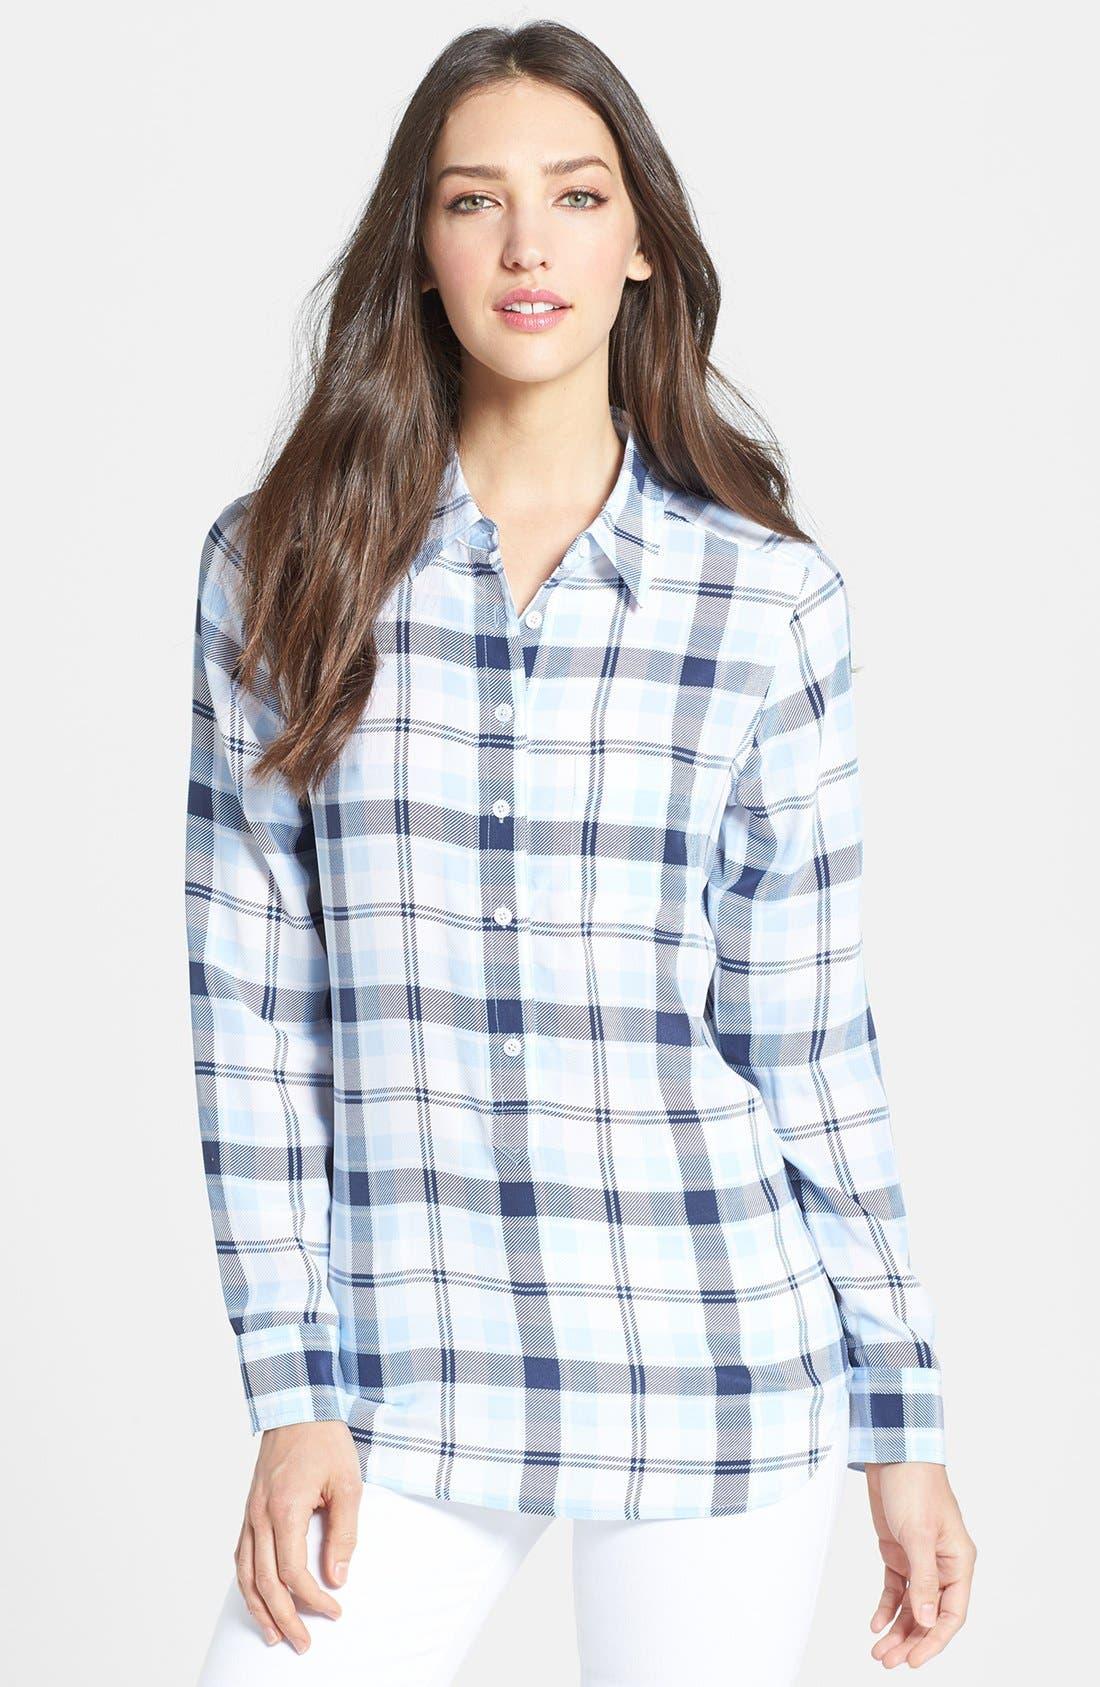 Alternate Image 1 Selected - Equipment 'Capri' Plaid Silk Shirt